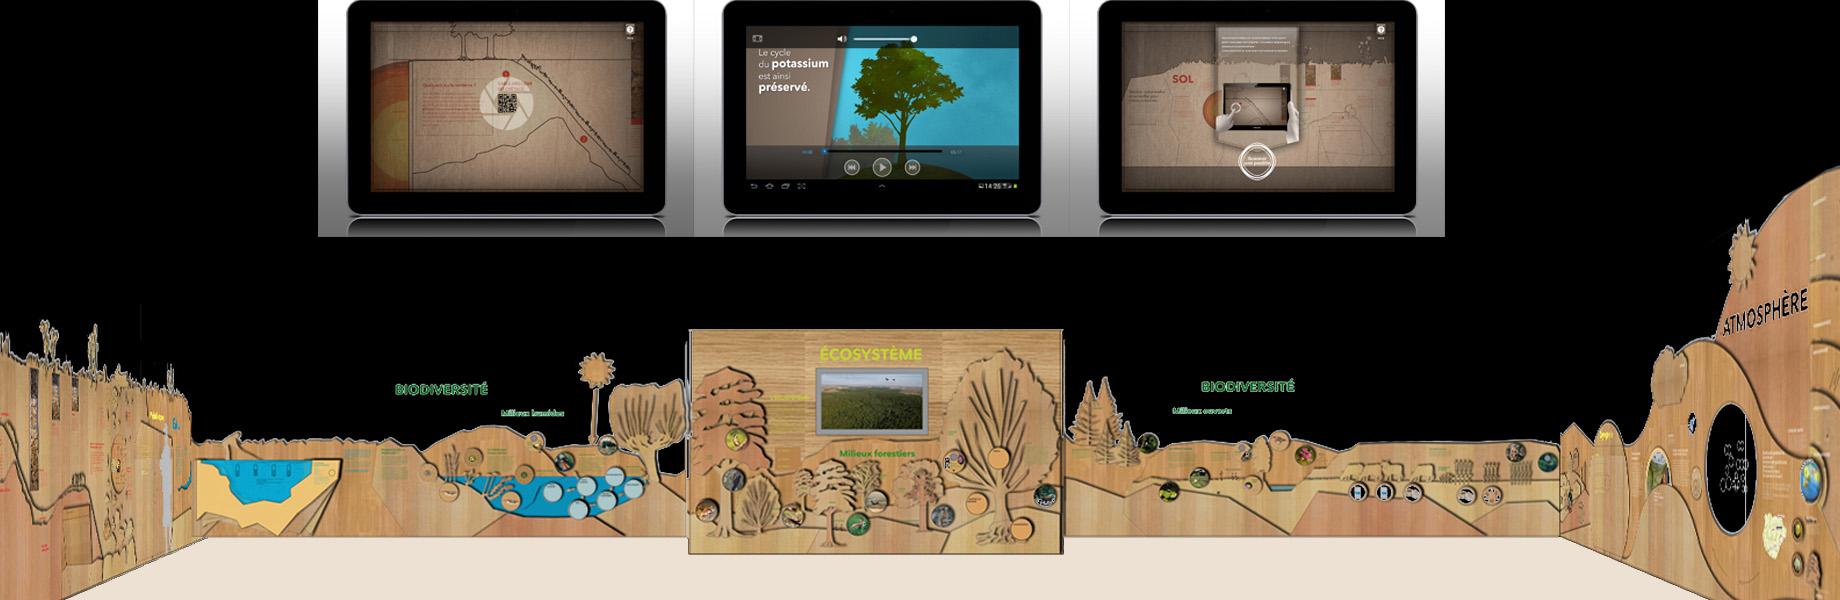 maskarade-scenographie-exposition-permanente-interactif-scientifique-animaux-tablettes